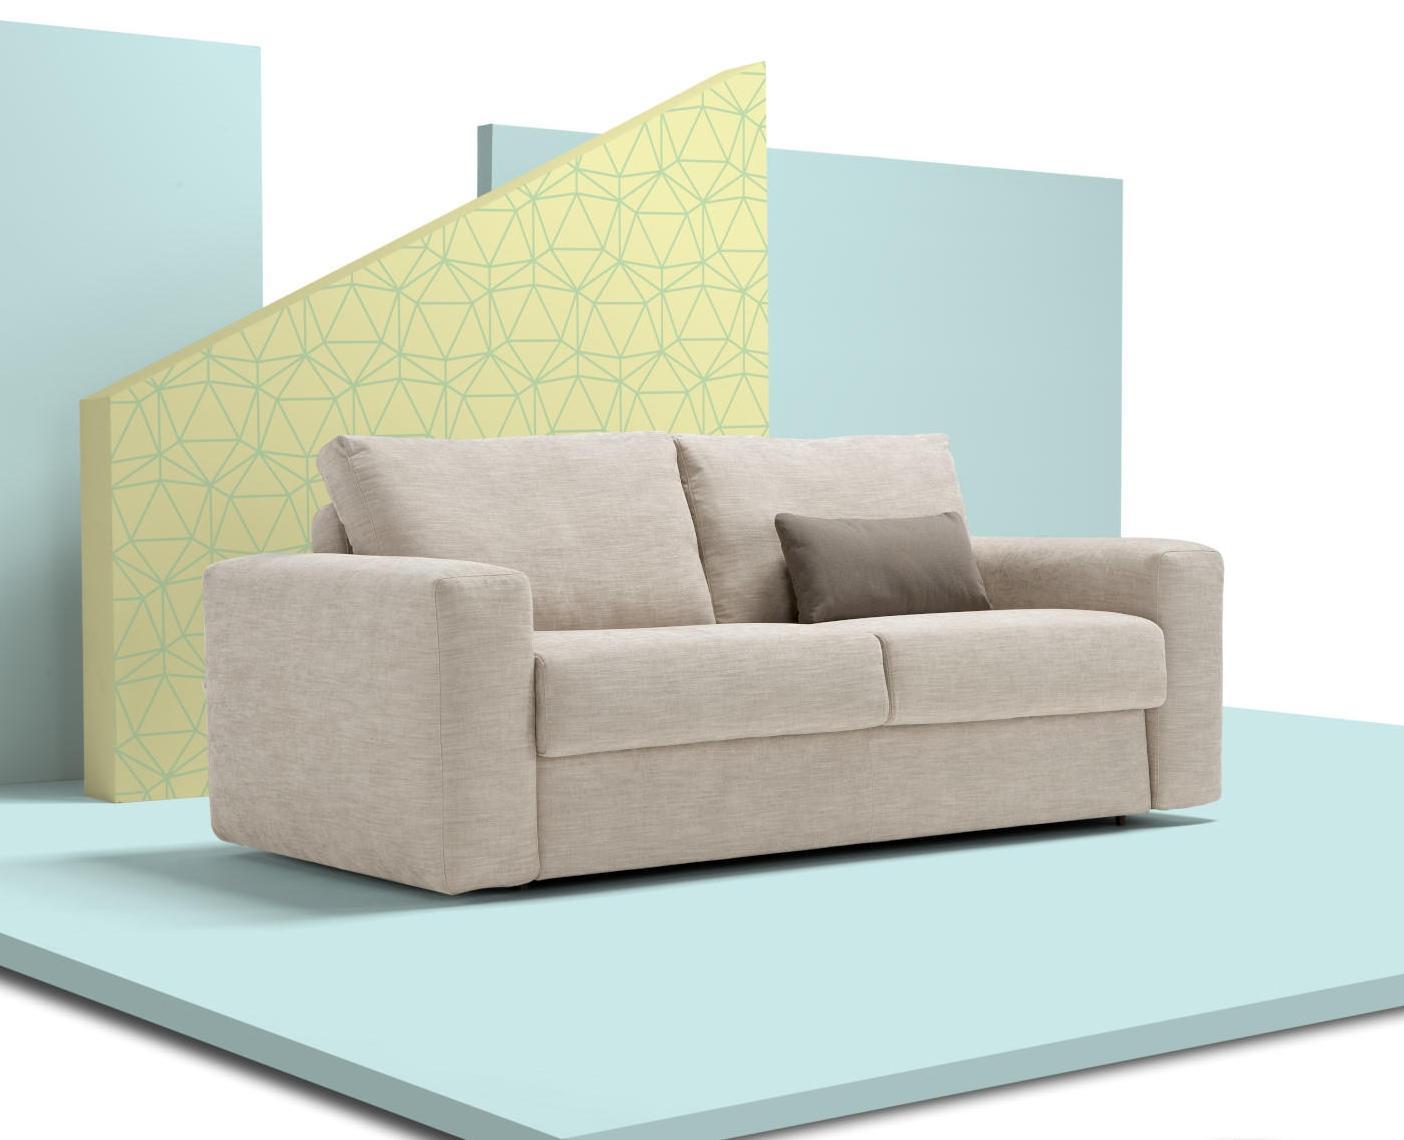 диван кровать Nuvola Dienne купить санкт петербург Mm 50463